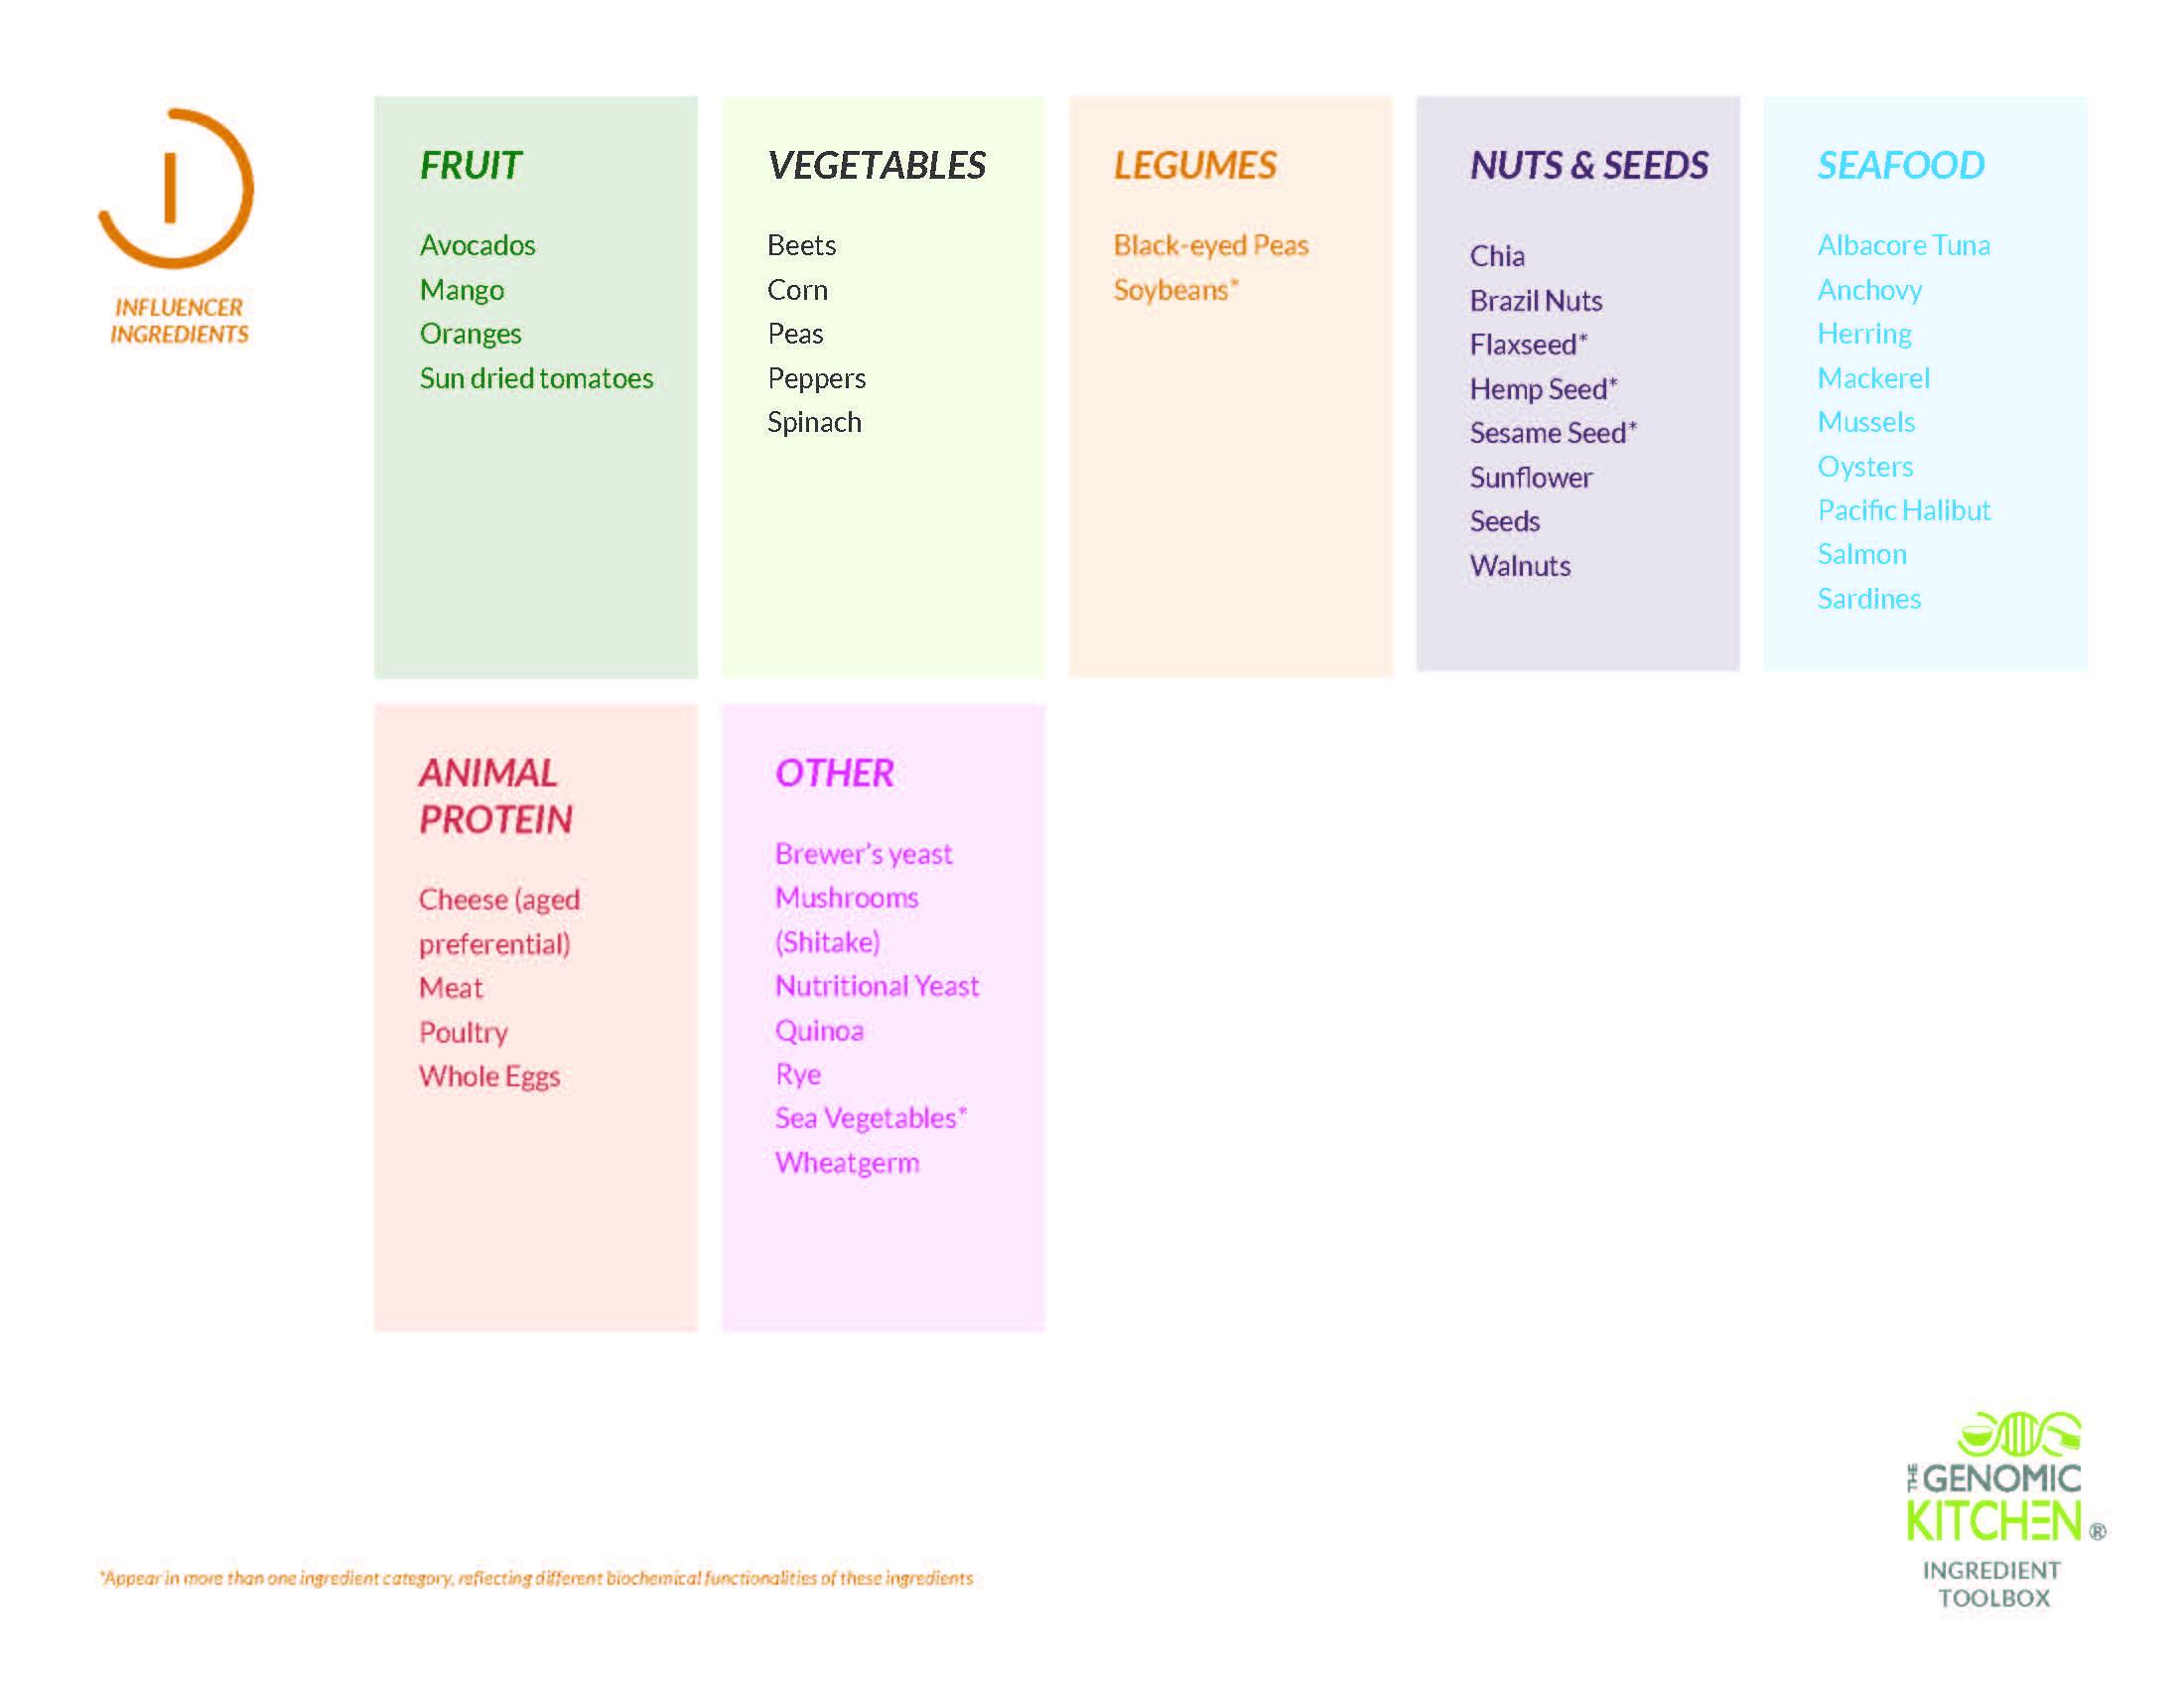 (I) Influencer Ingredients -